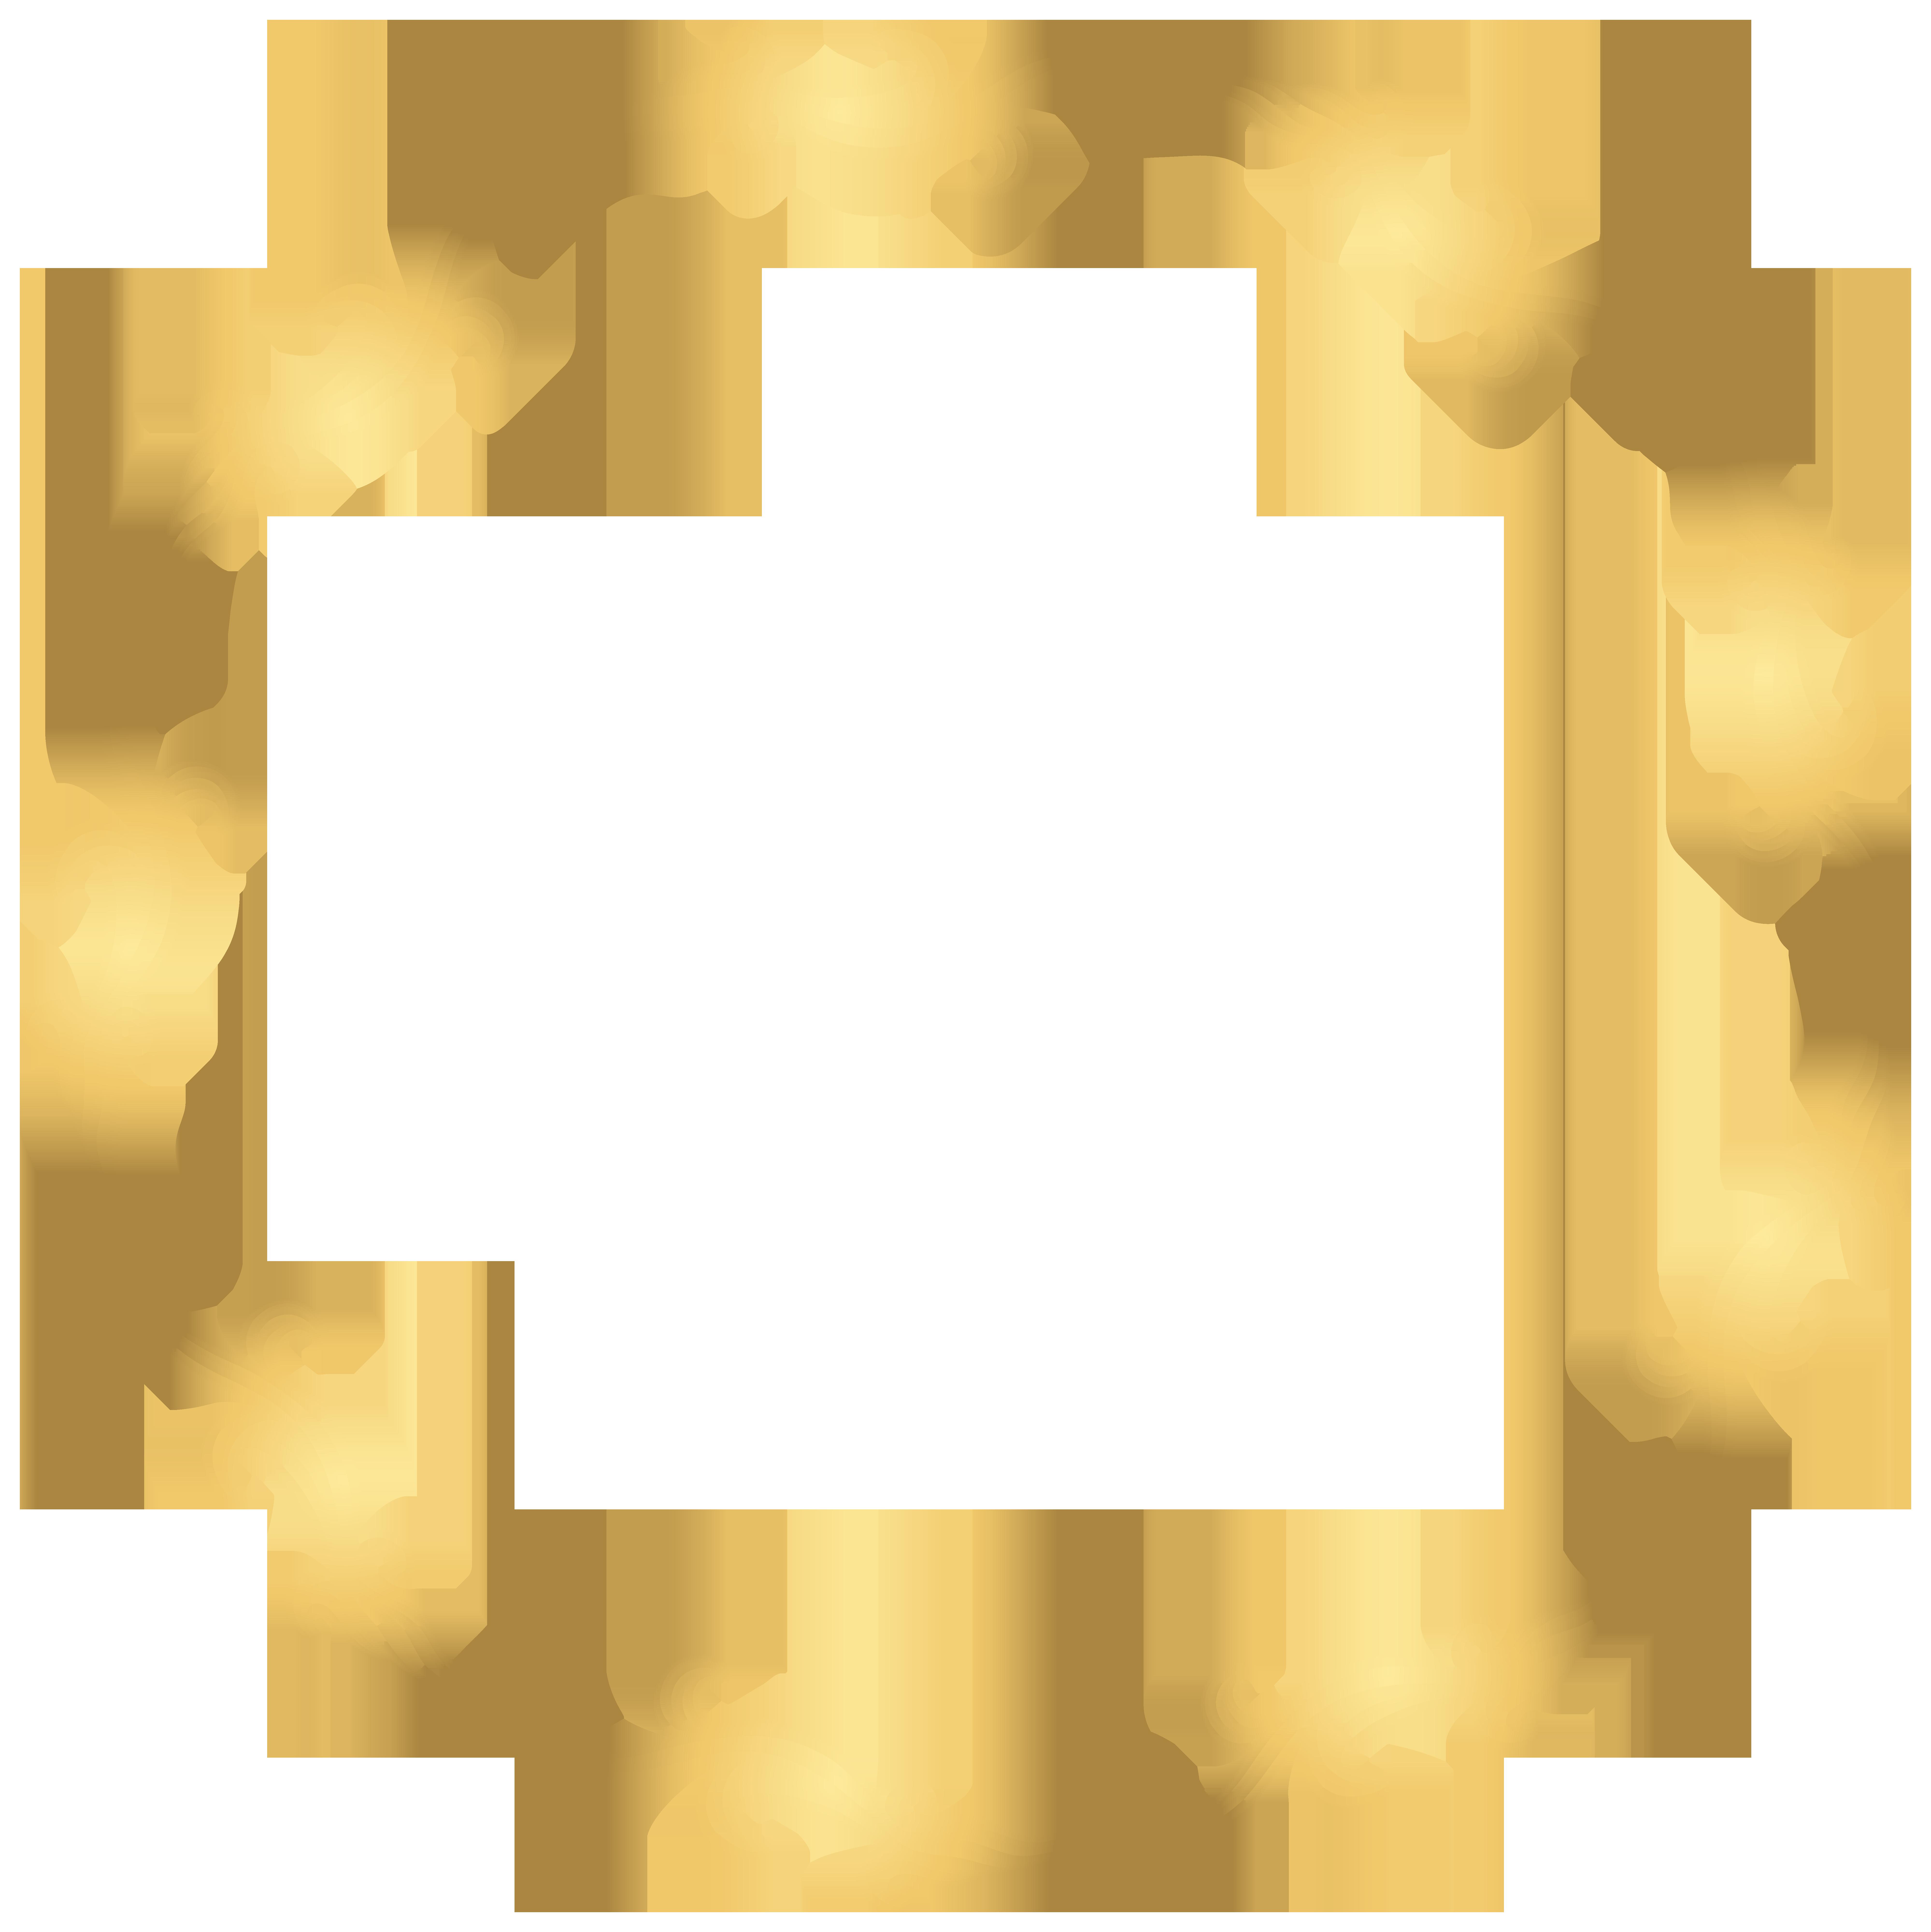 Necklace clipart border #10